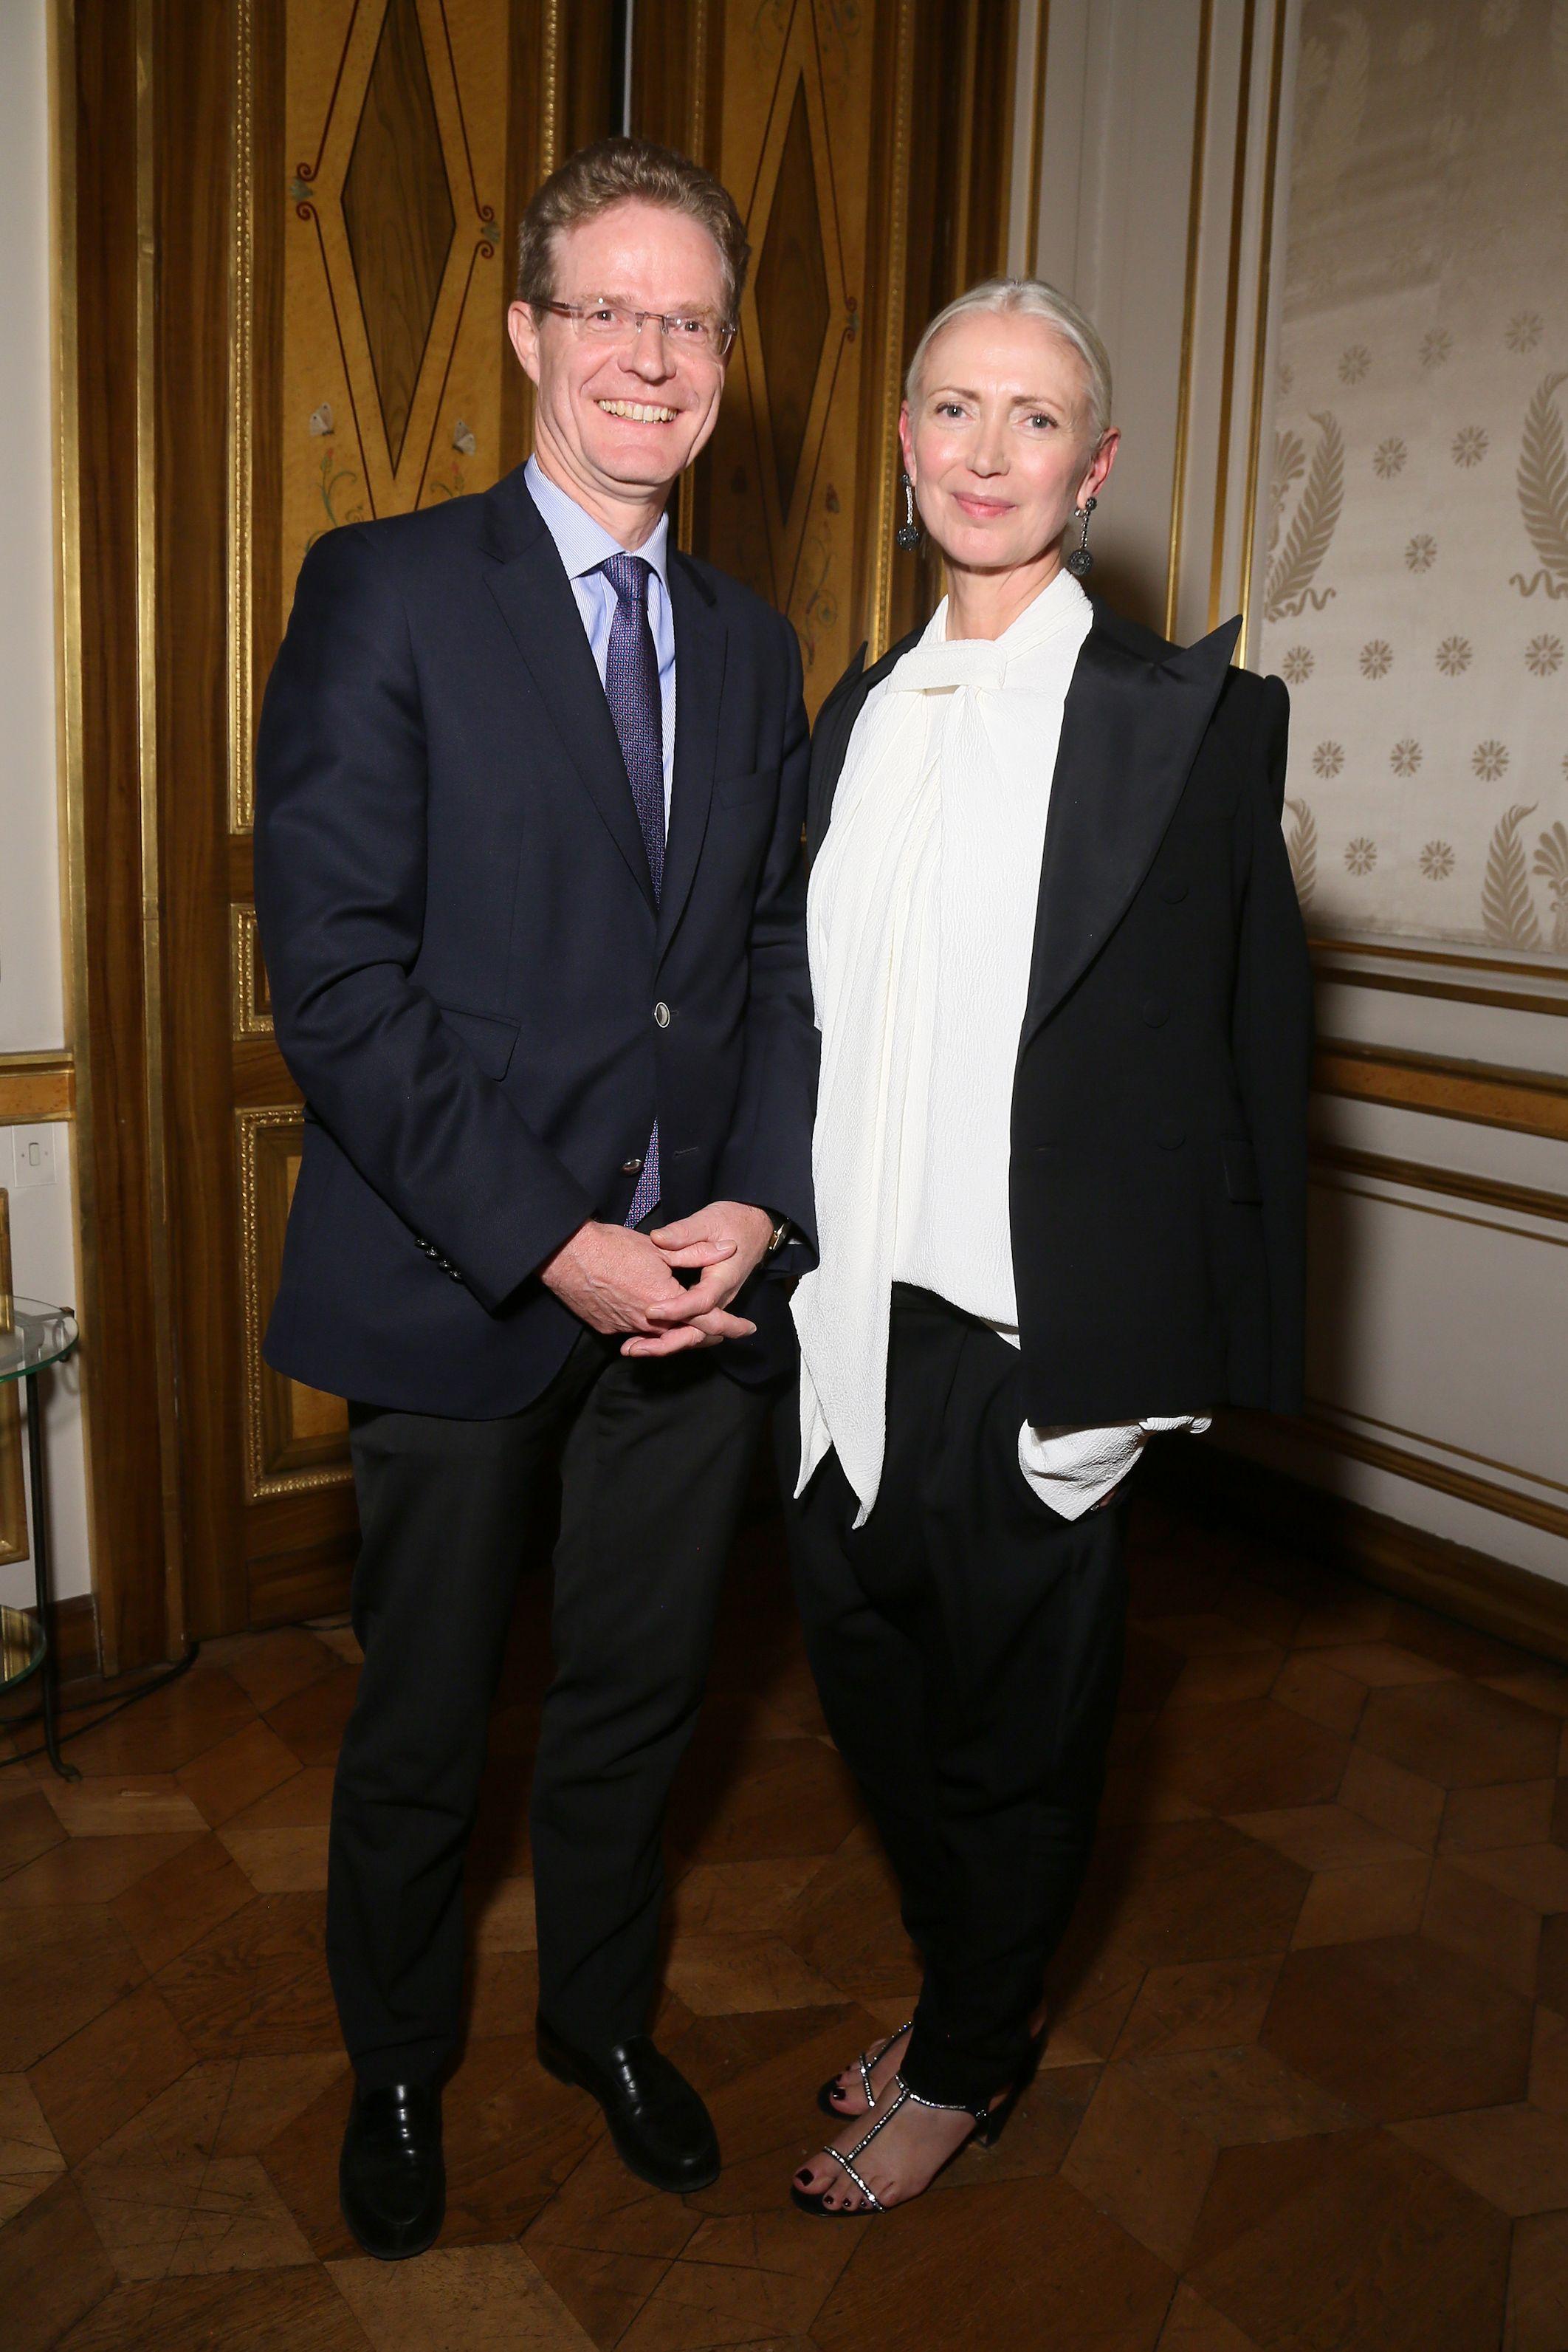 Nikolaus Meyer-Landrut Ambassador of the Federal Republic of Germany and Christiane Arp attend Der Berliner Mode Salon